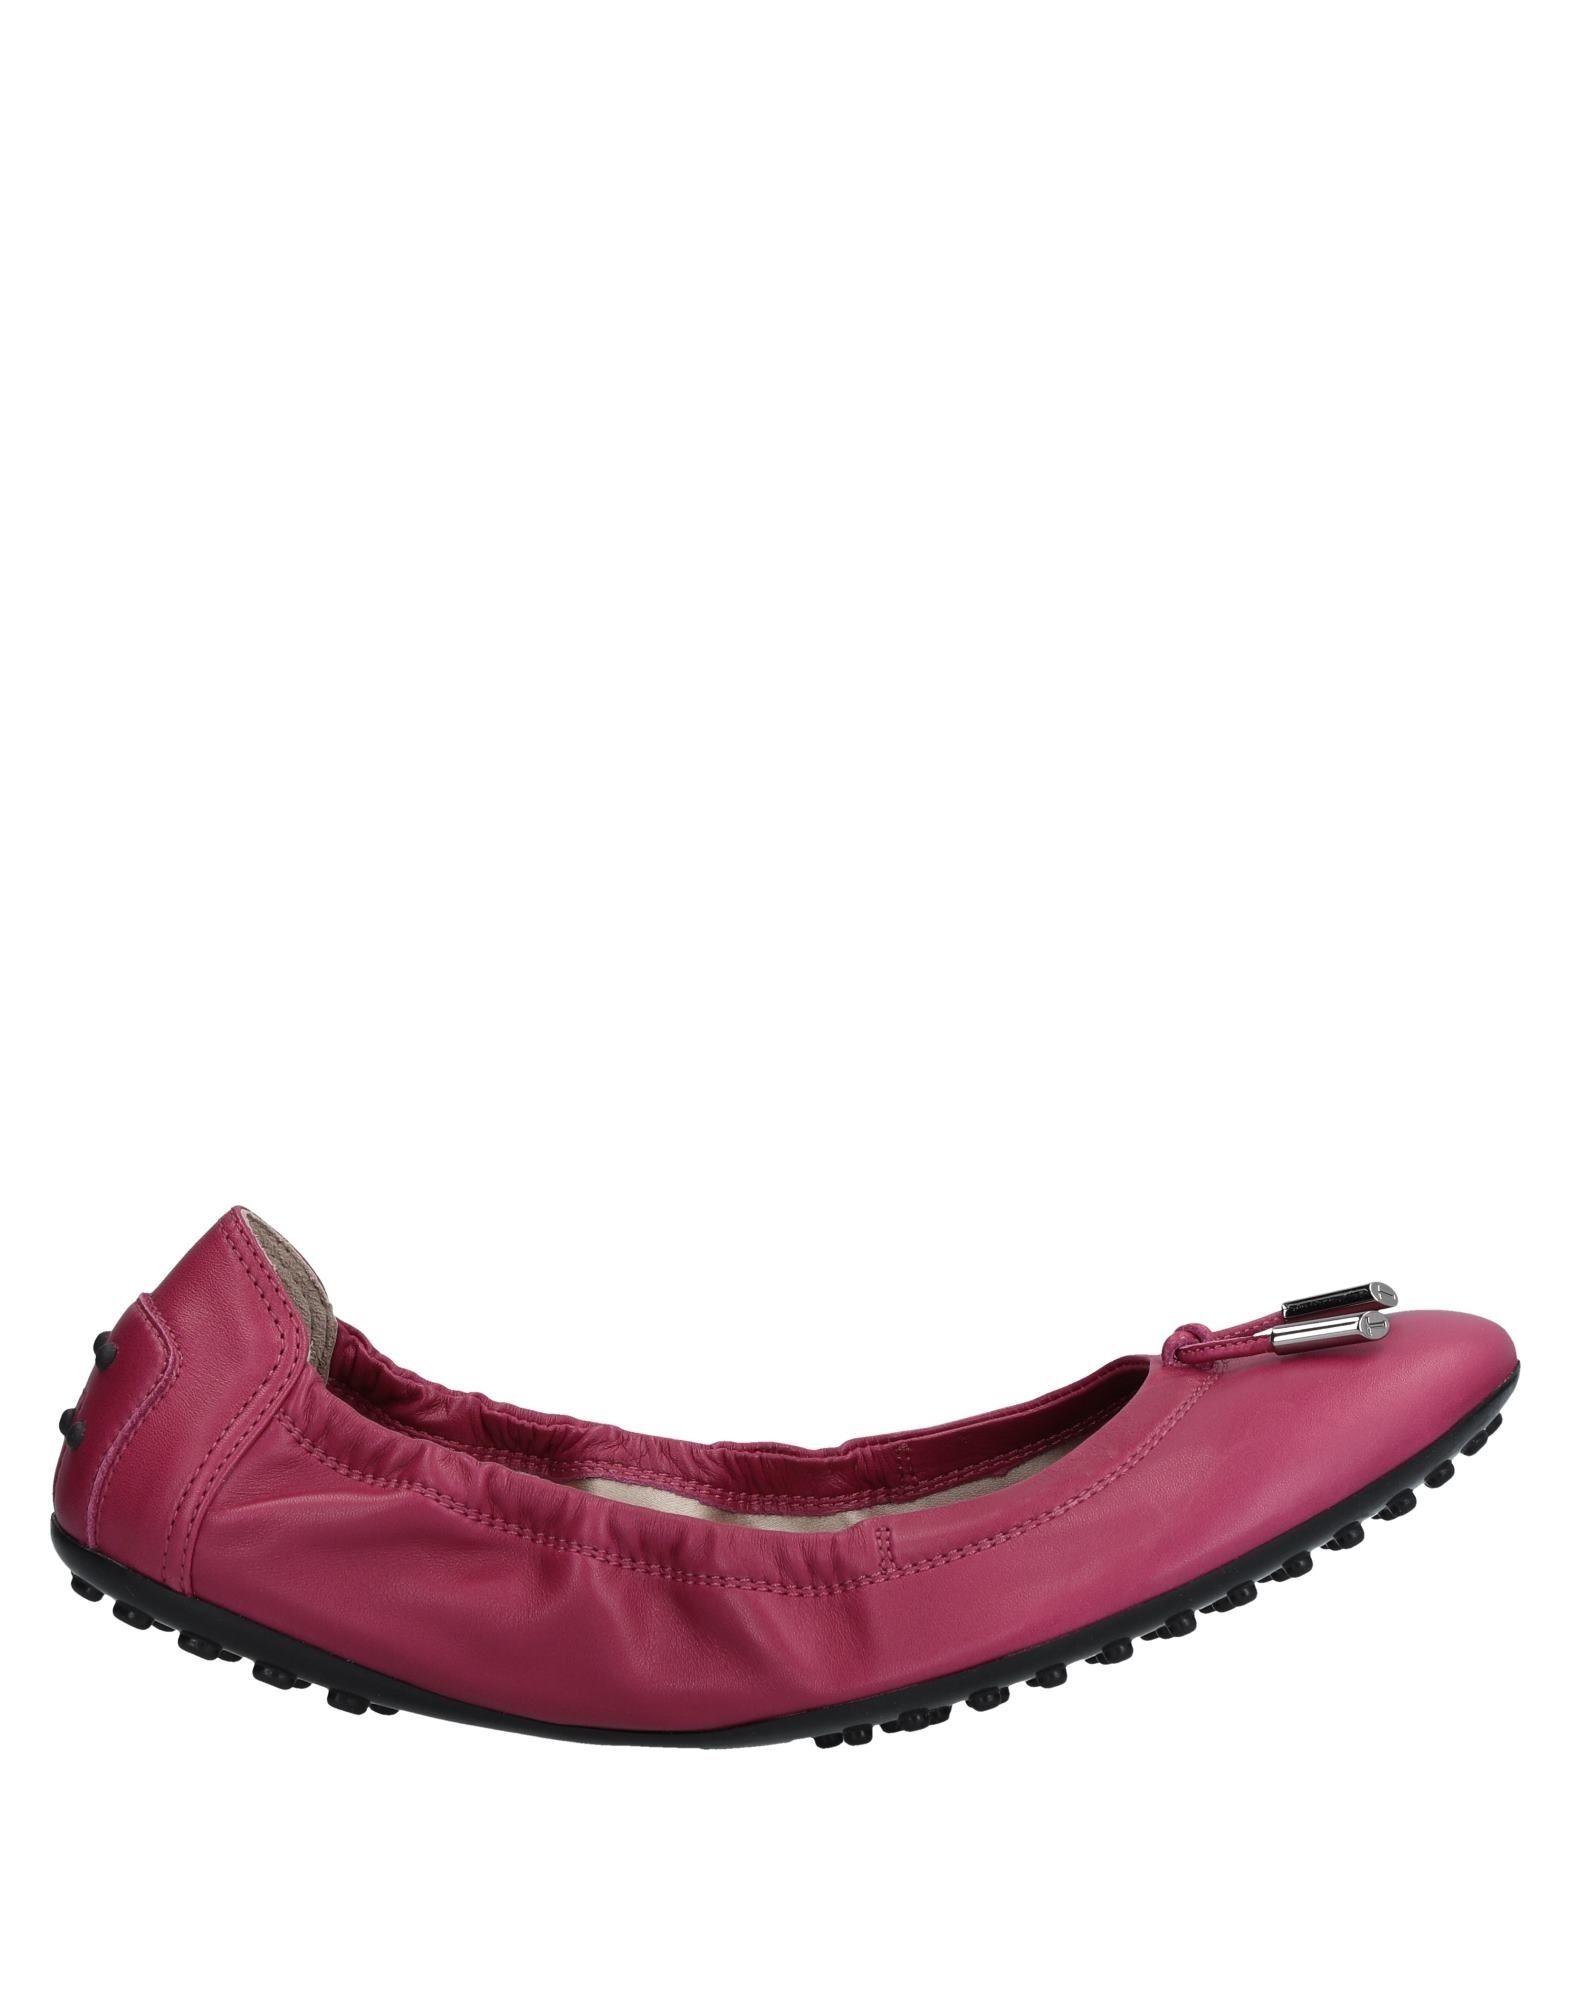 Haltbare Mode billige Schuhe Tod's Ballerinas Damen  11310956JU Heiße Schuhe